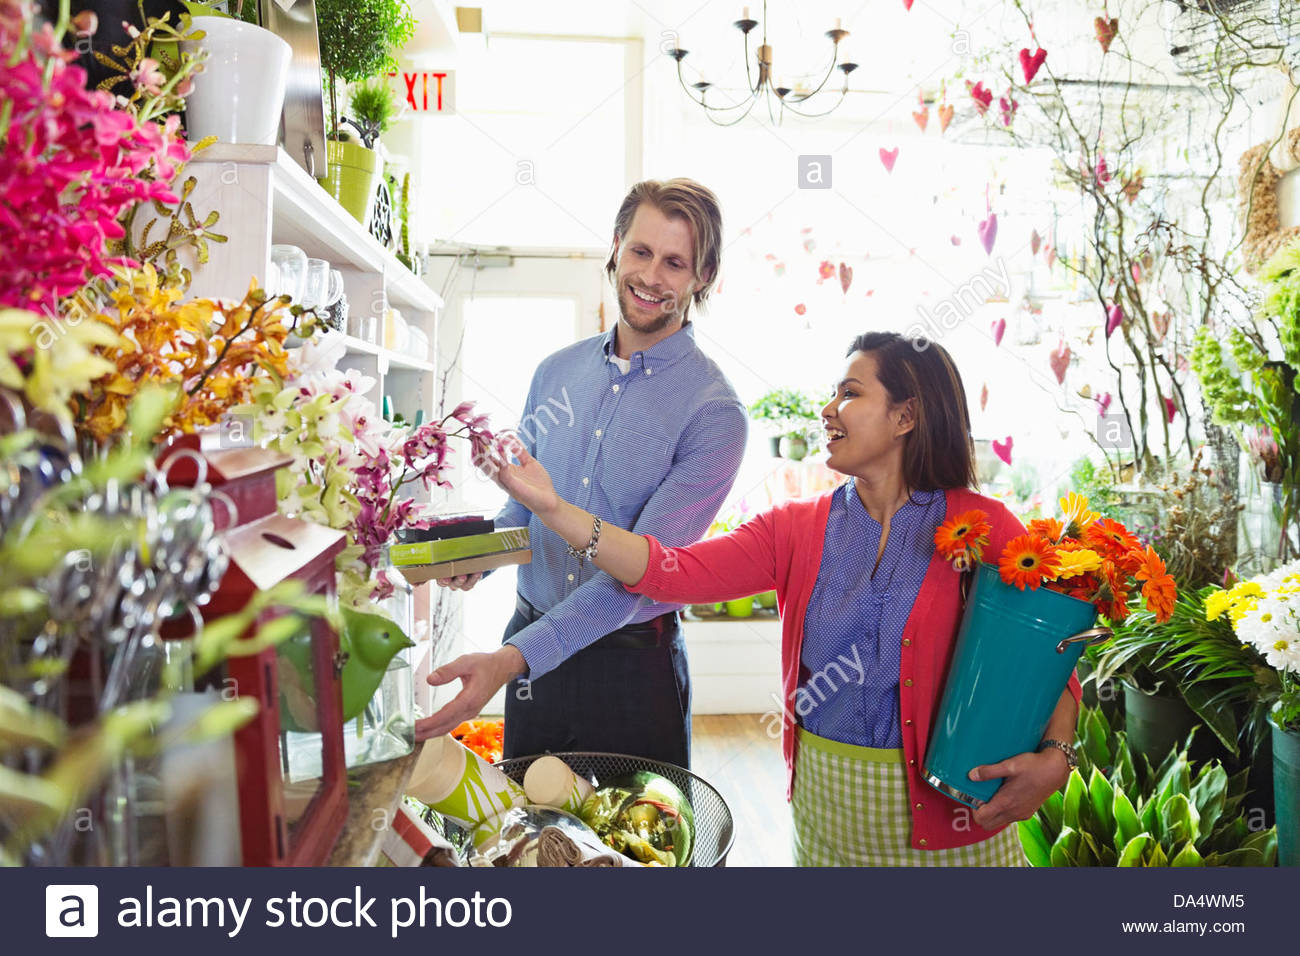 Florist femenino ayudando cliente masculino en flower shop Imagen De Stock